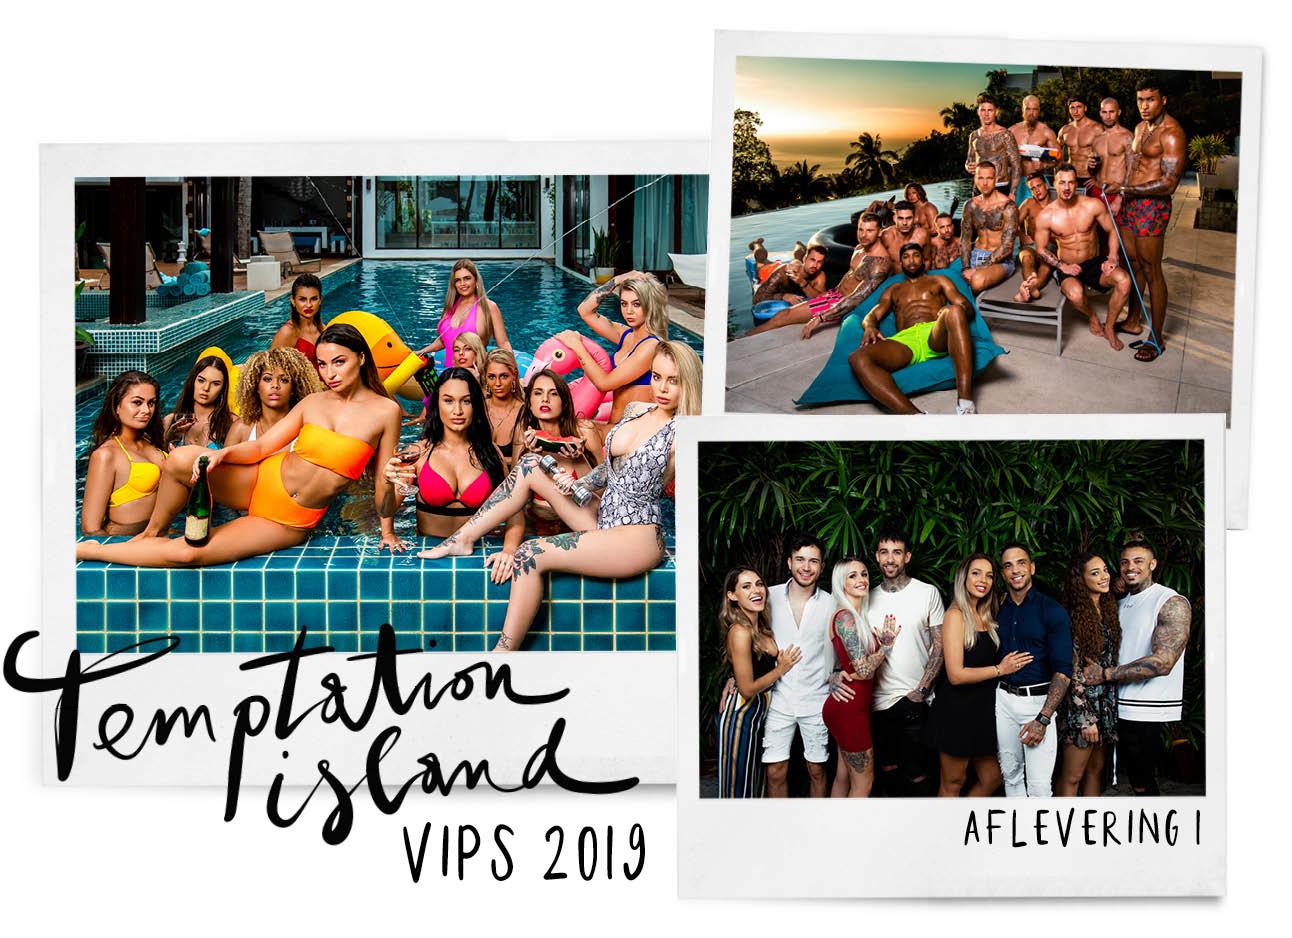 temptation island vips 2019